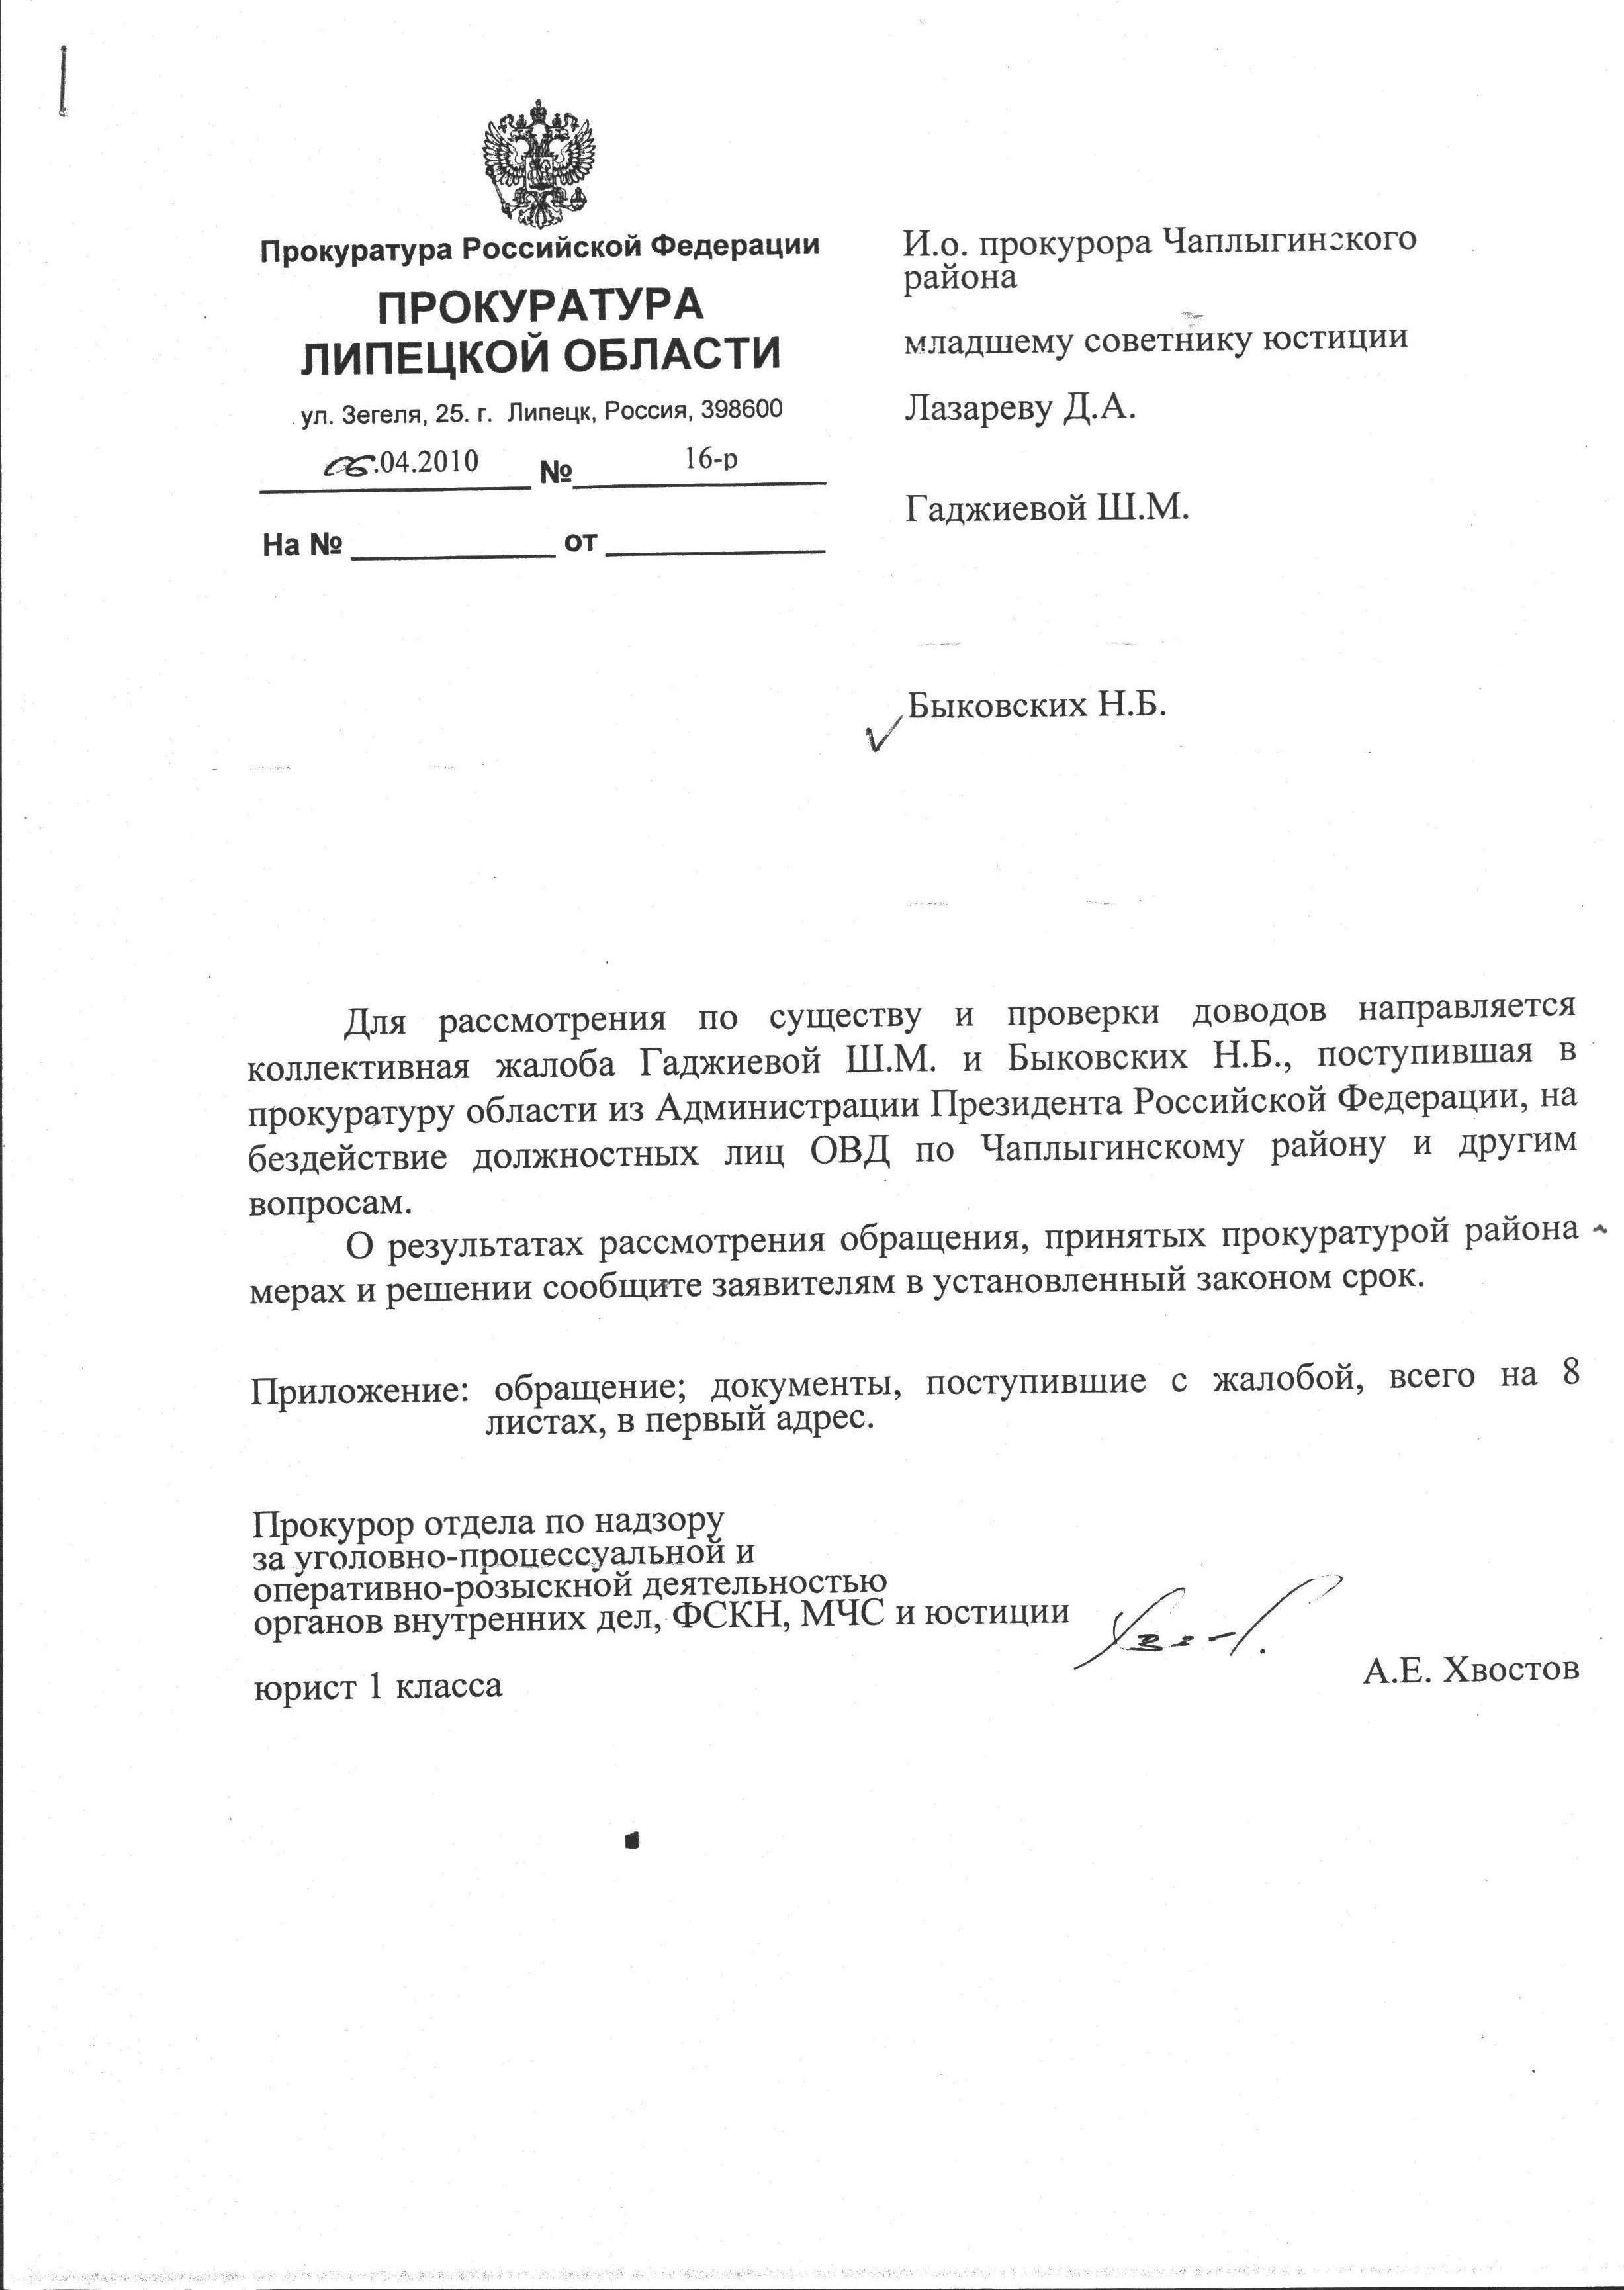 Прокуратура Липецкой области